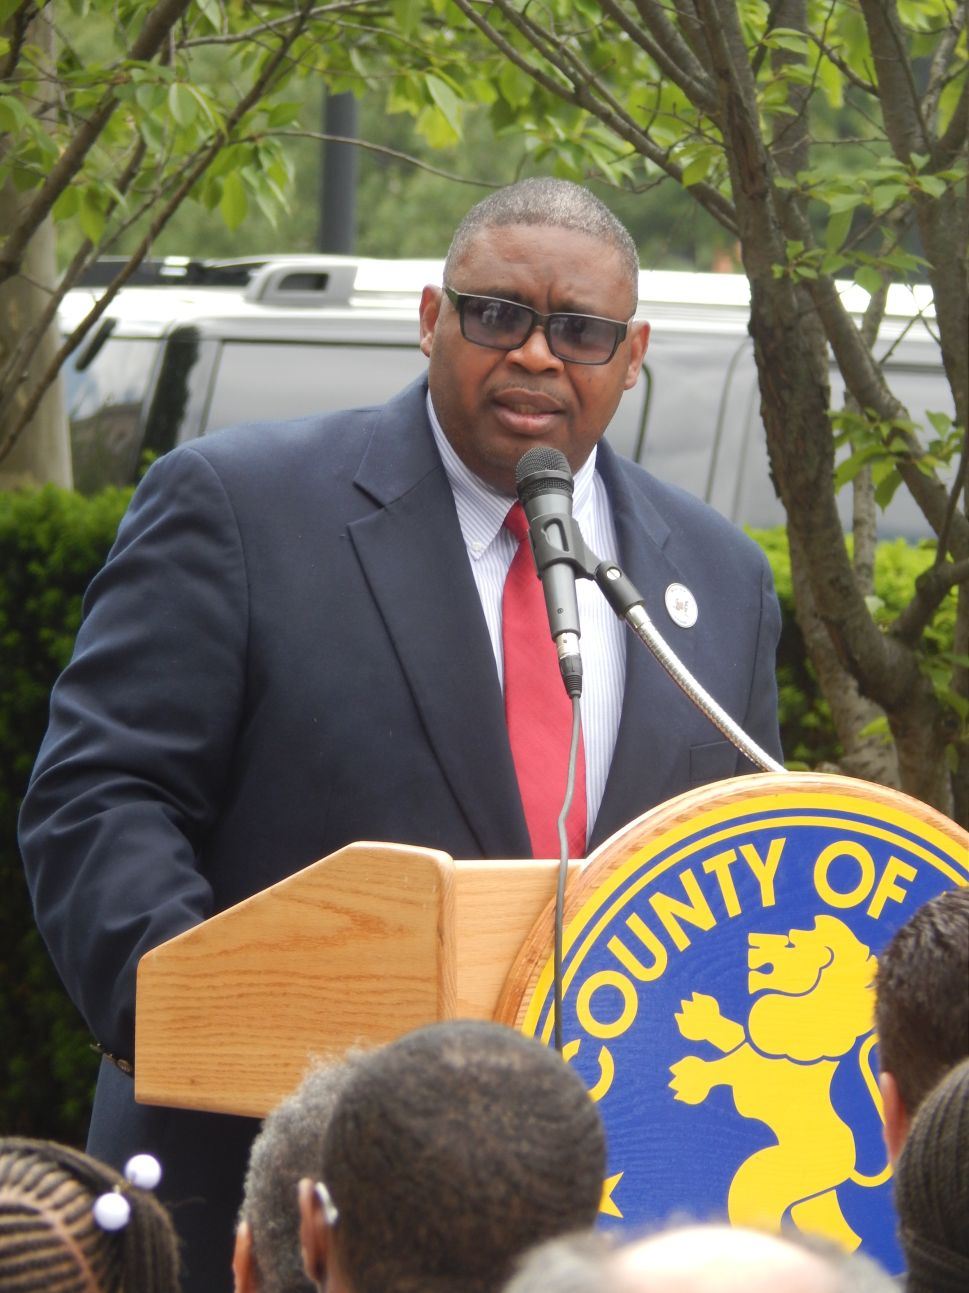 Essex County honors D. Bilal Beasley